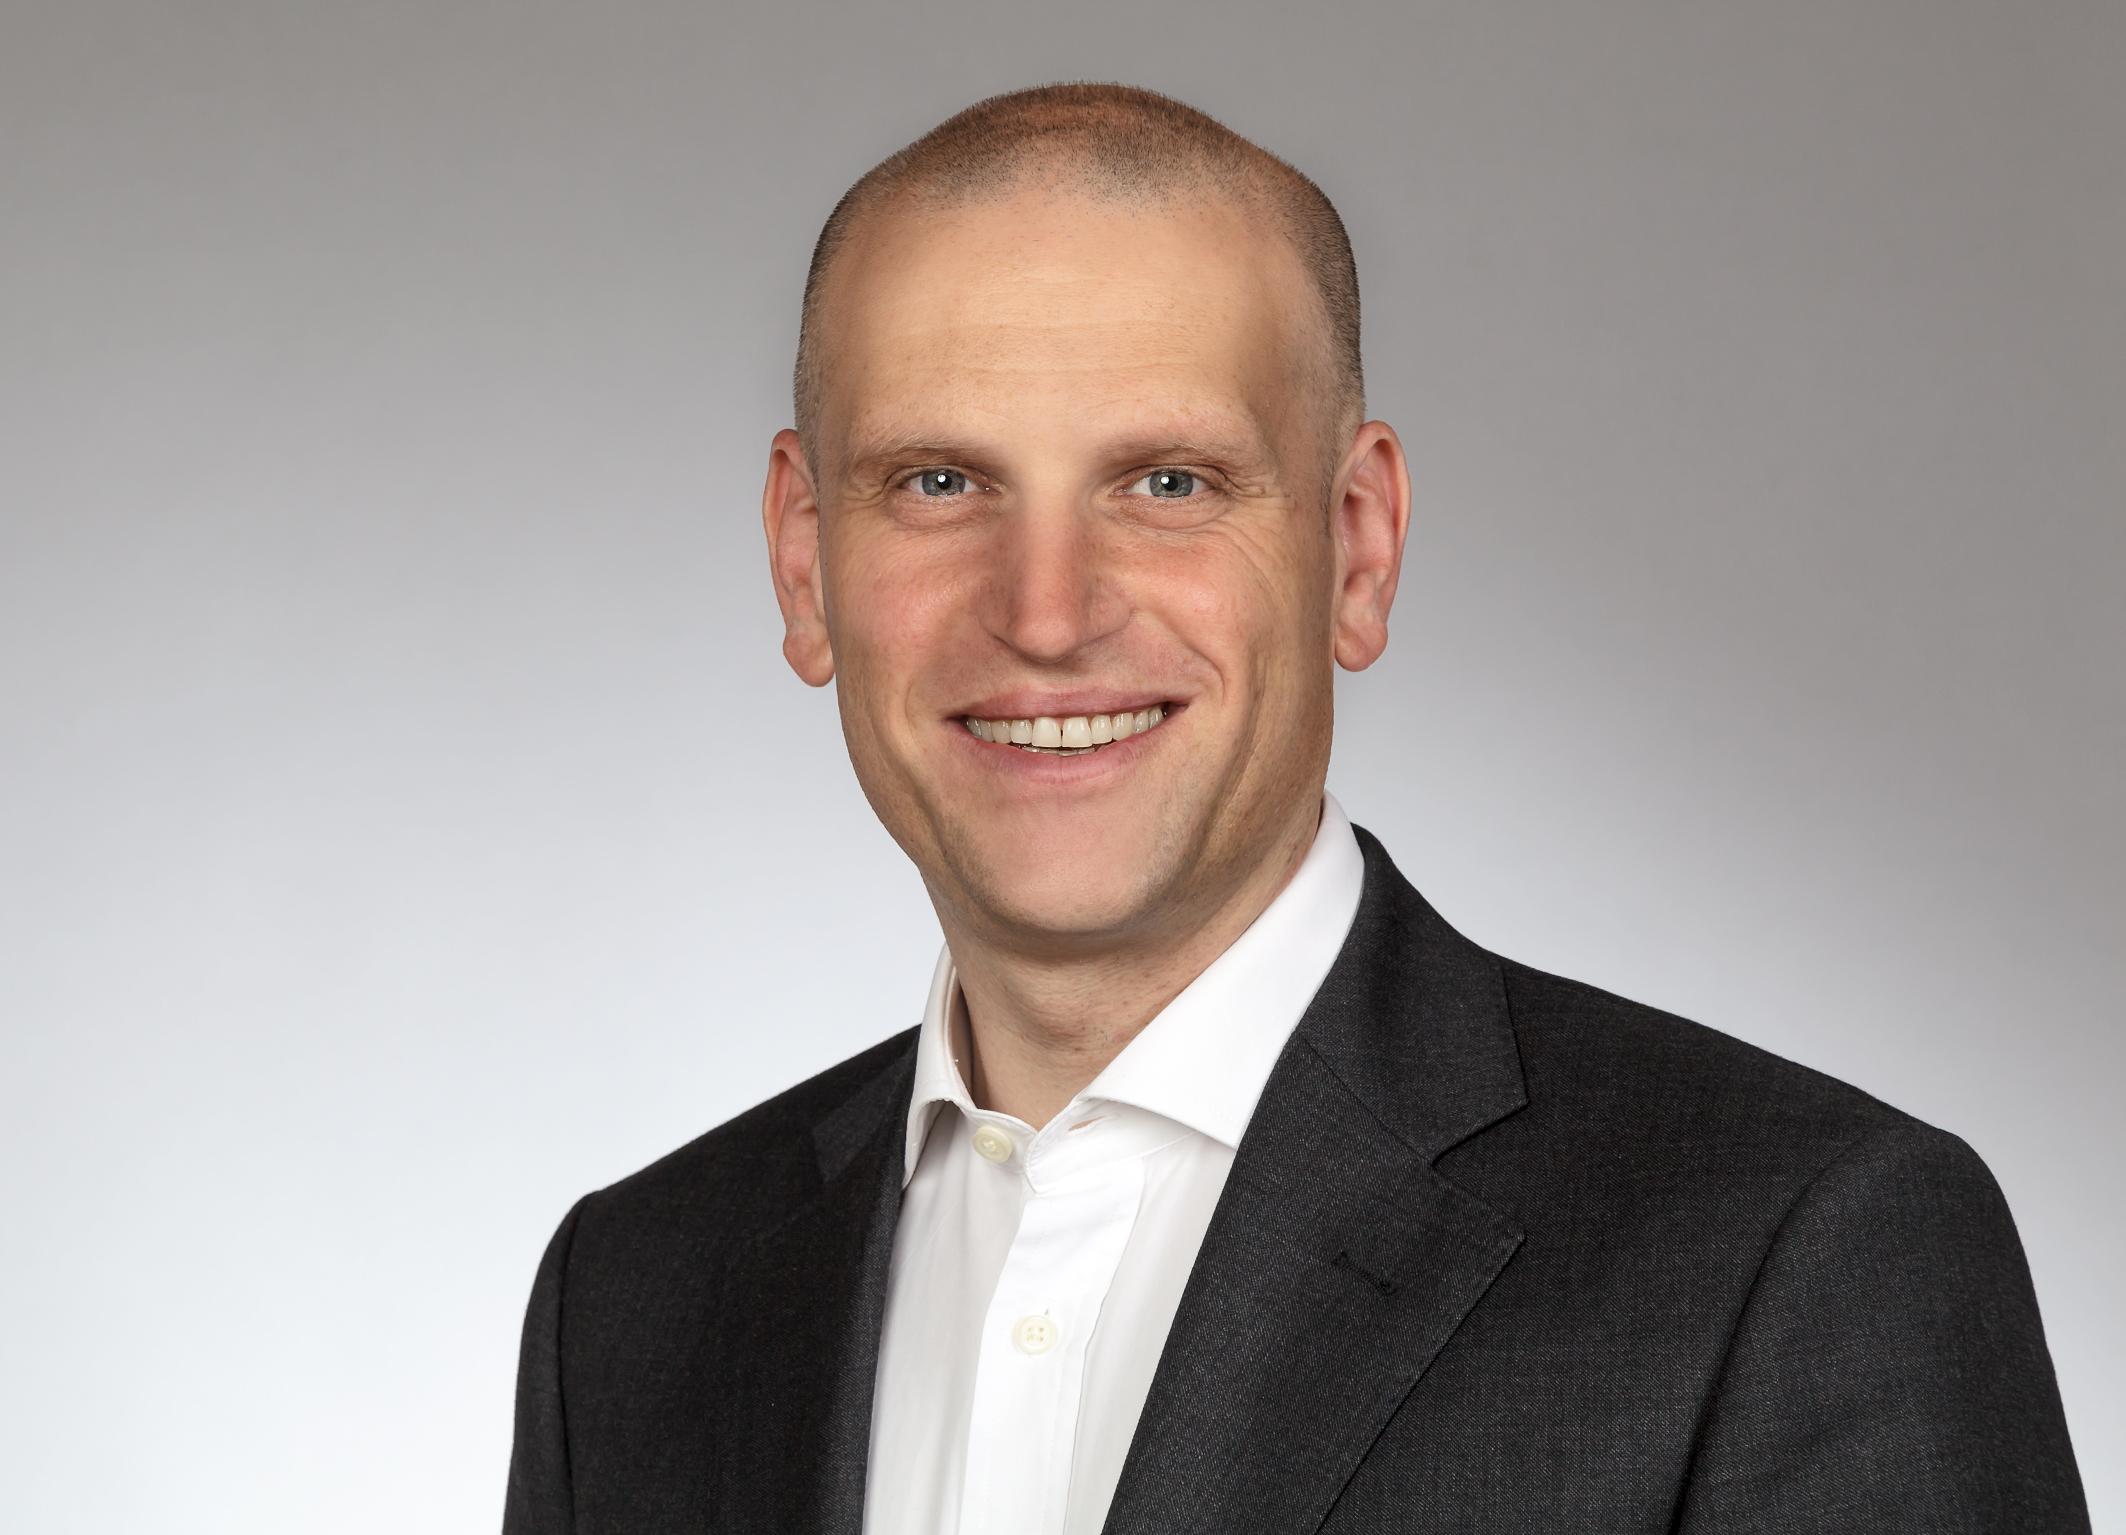 Mathias Weigert, CEO of Unternehmer-Schmiede